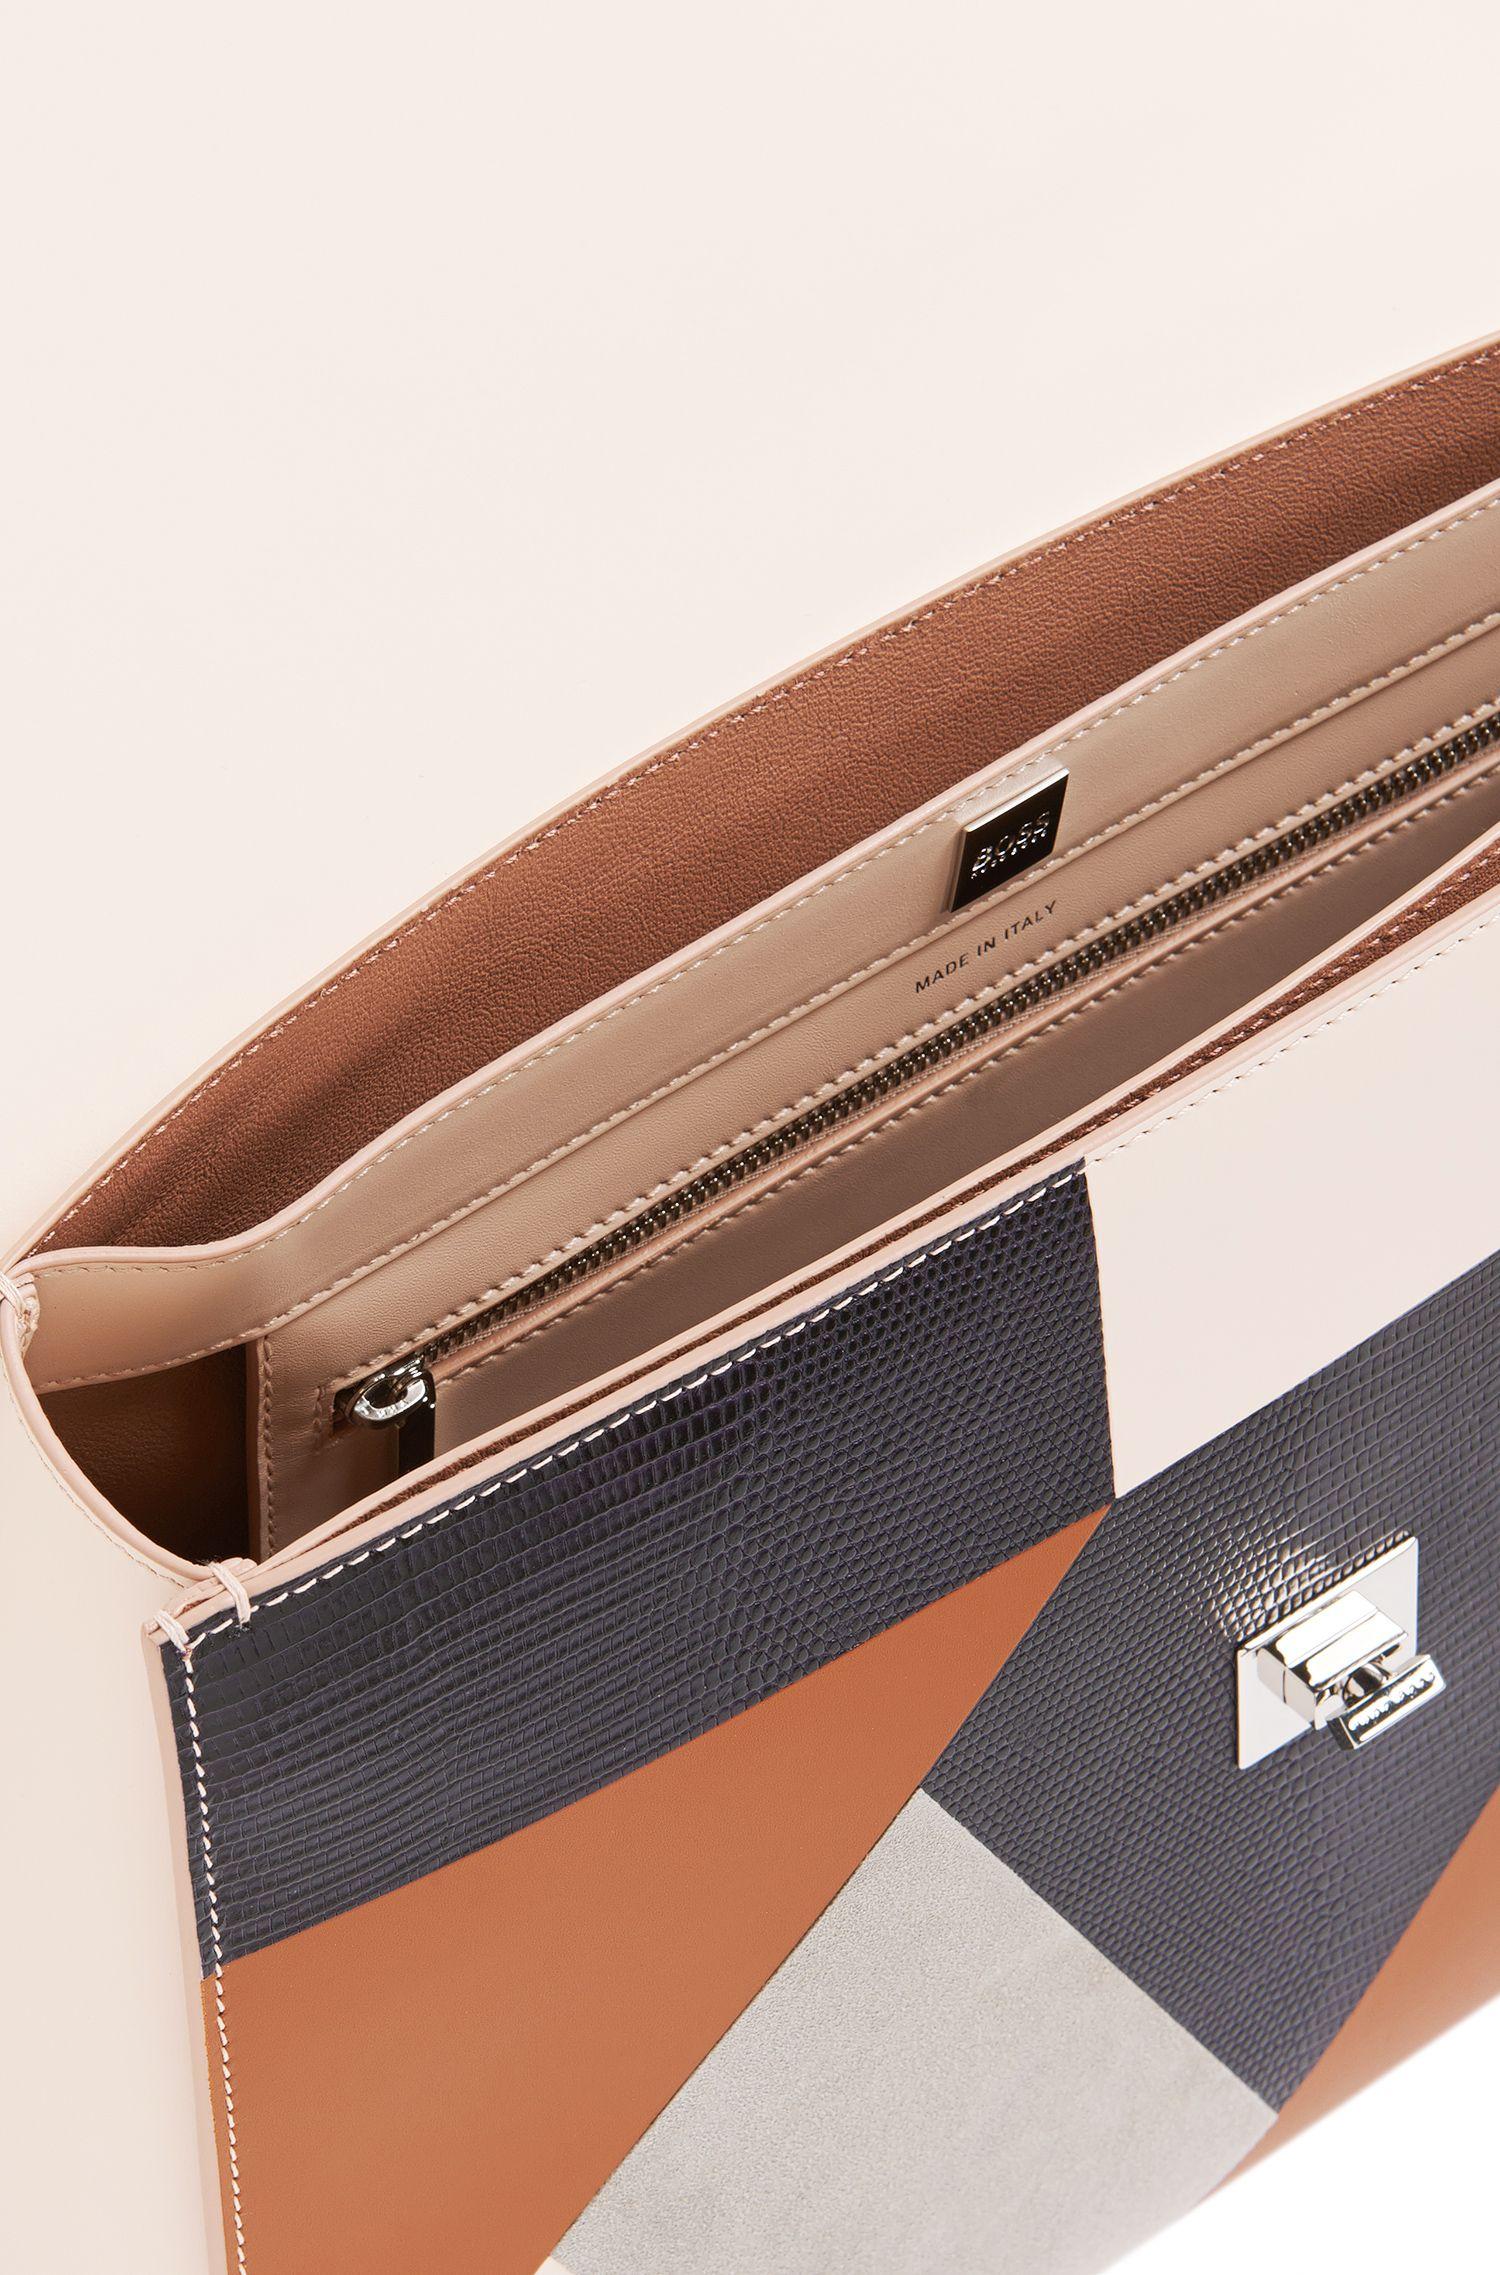 Runway Edition BOSS Bespoke Handtasche aus Leder-Mix in Patchwork-Optik